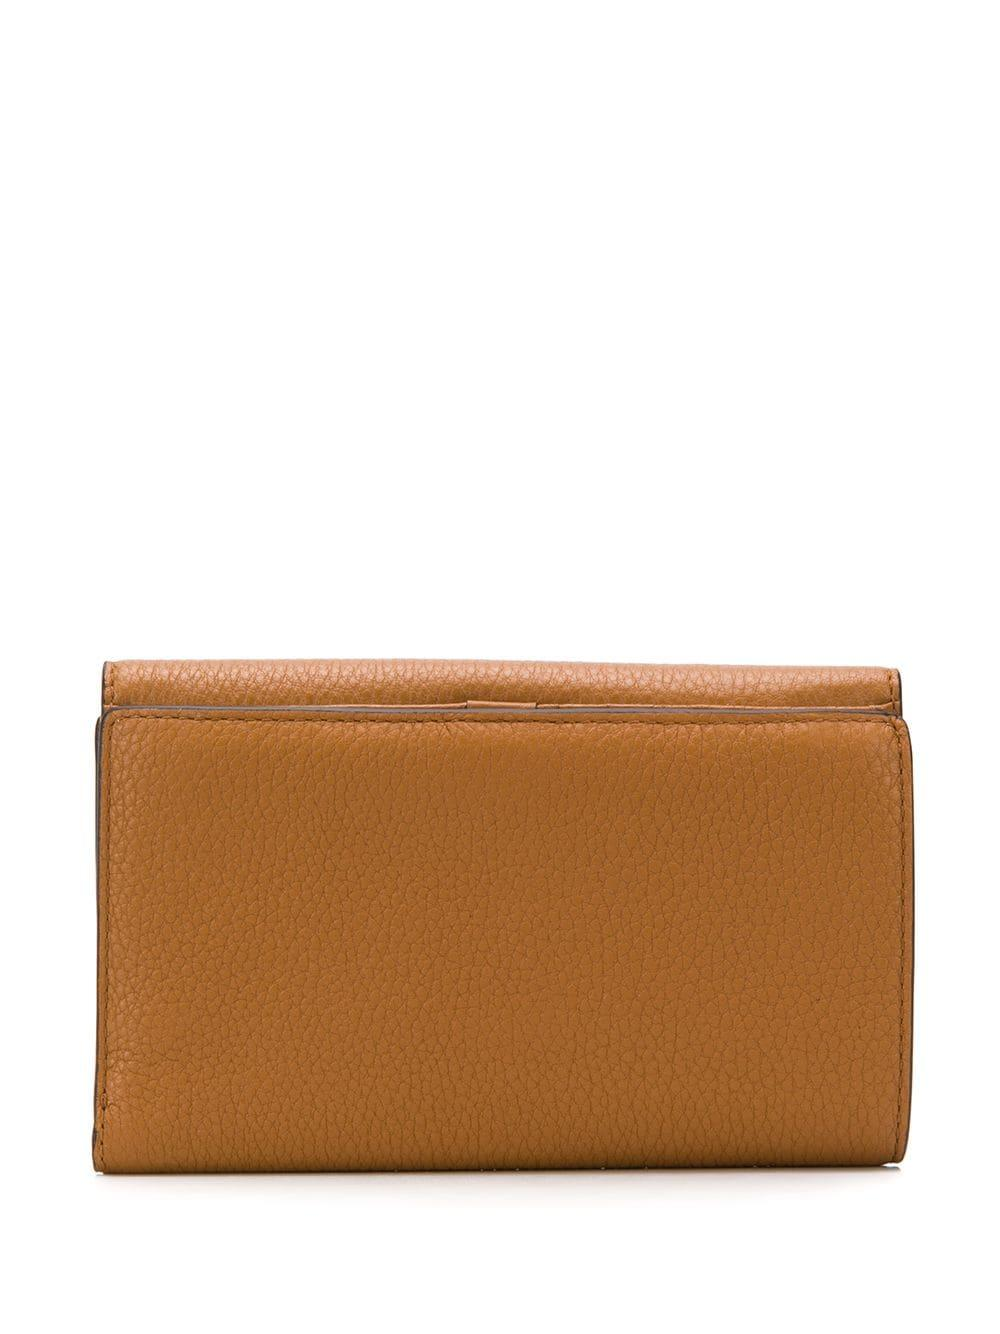 b9fd4e40f137 Lyst - MICHAEL Michael Kors Logo Trifold Wallet in Brown for Men